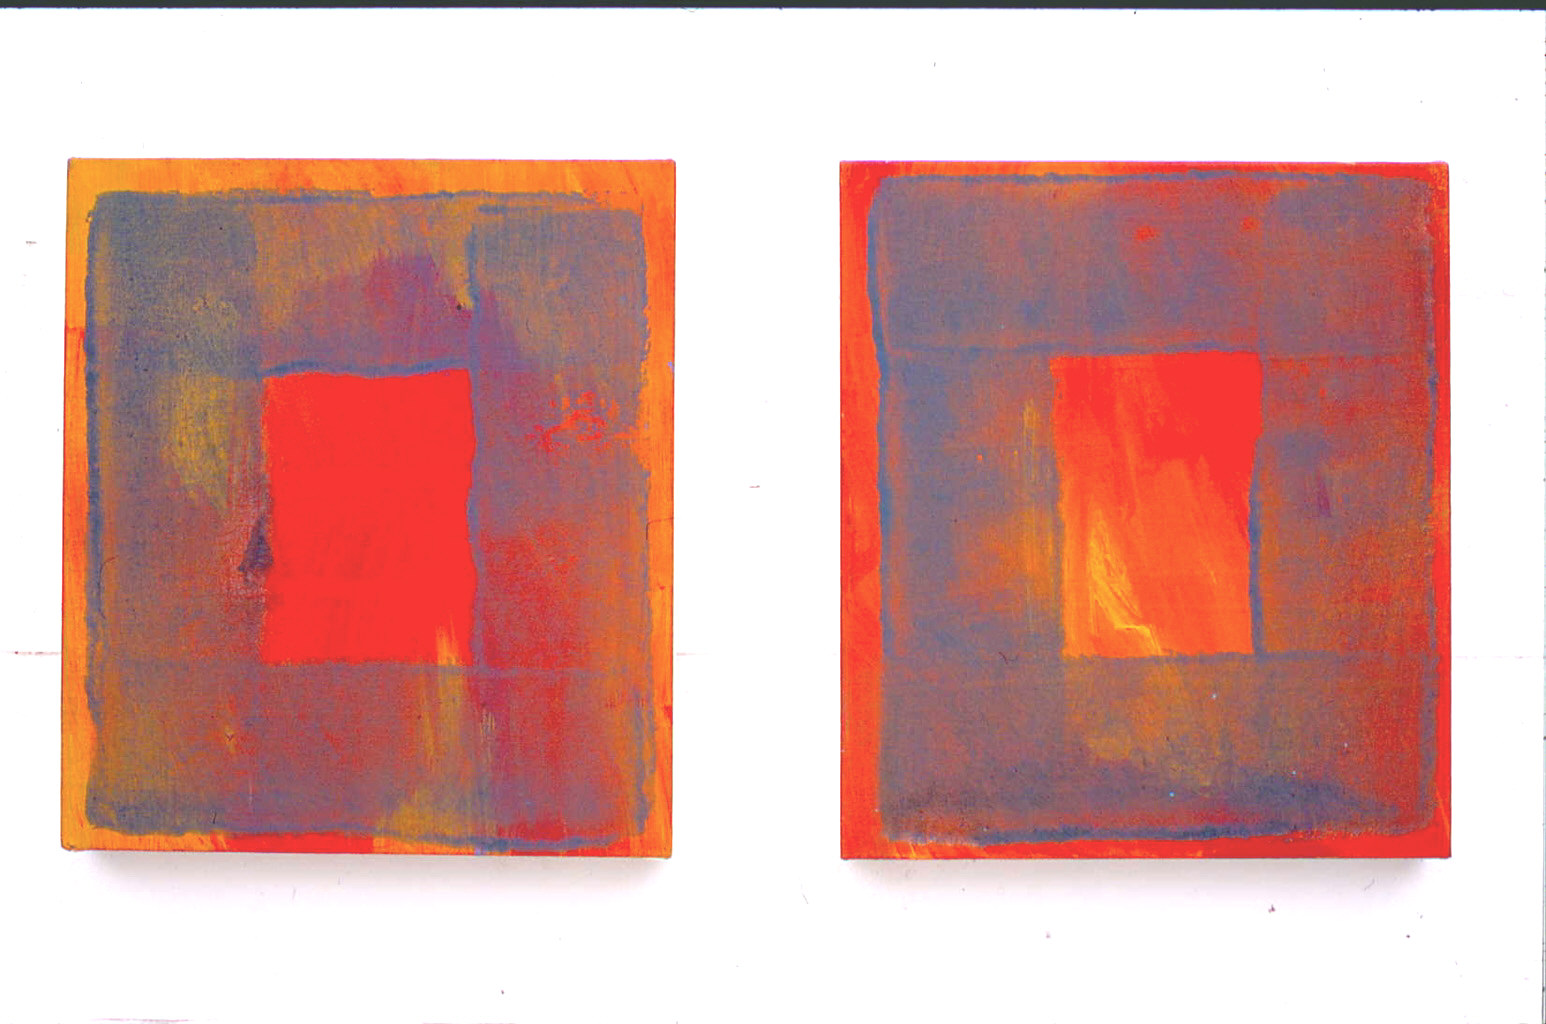 Orange study  acrylic on canvas  41cm x 36cm x 2  2001